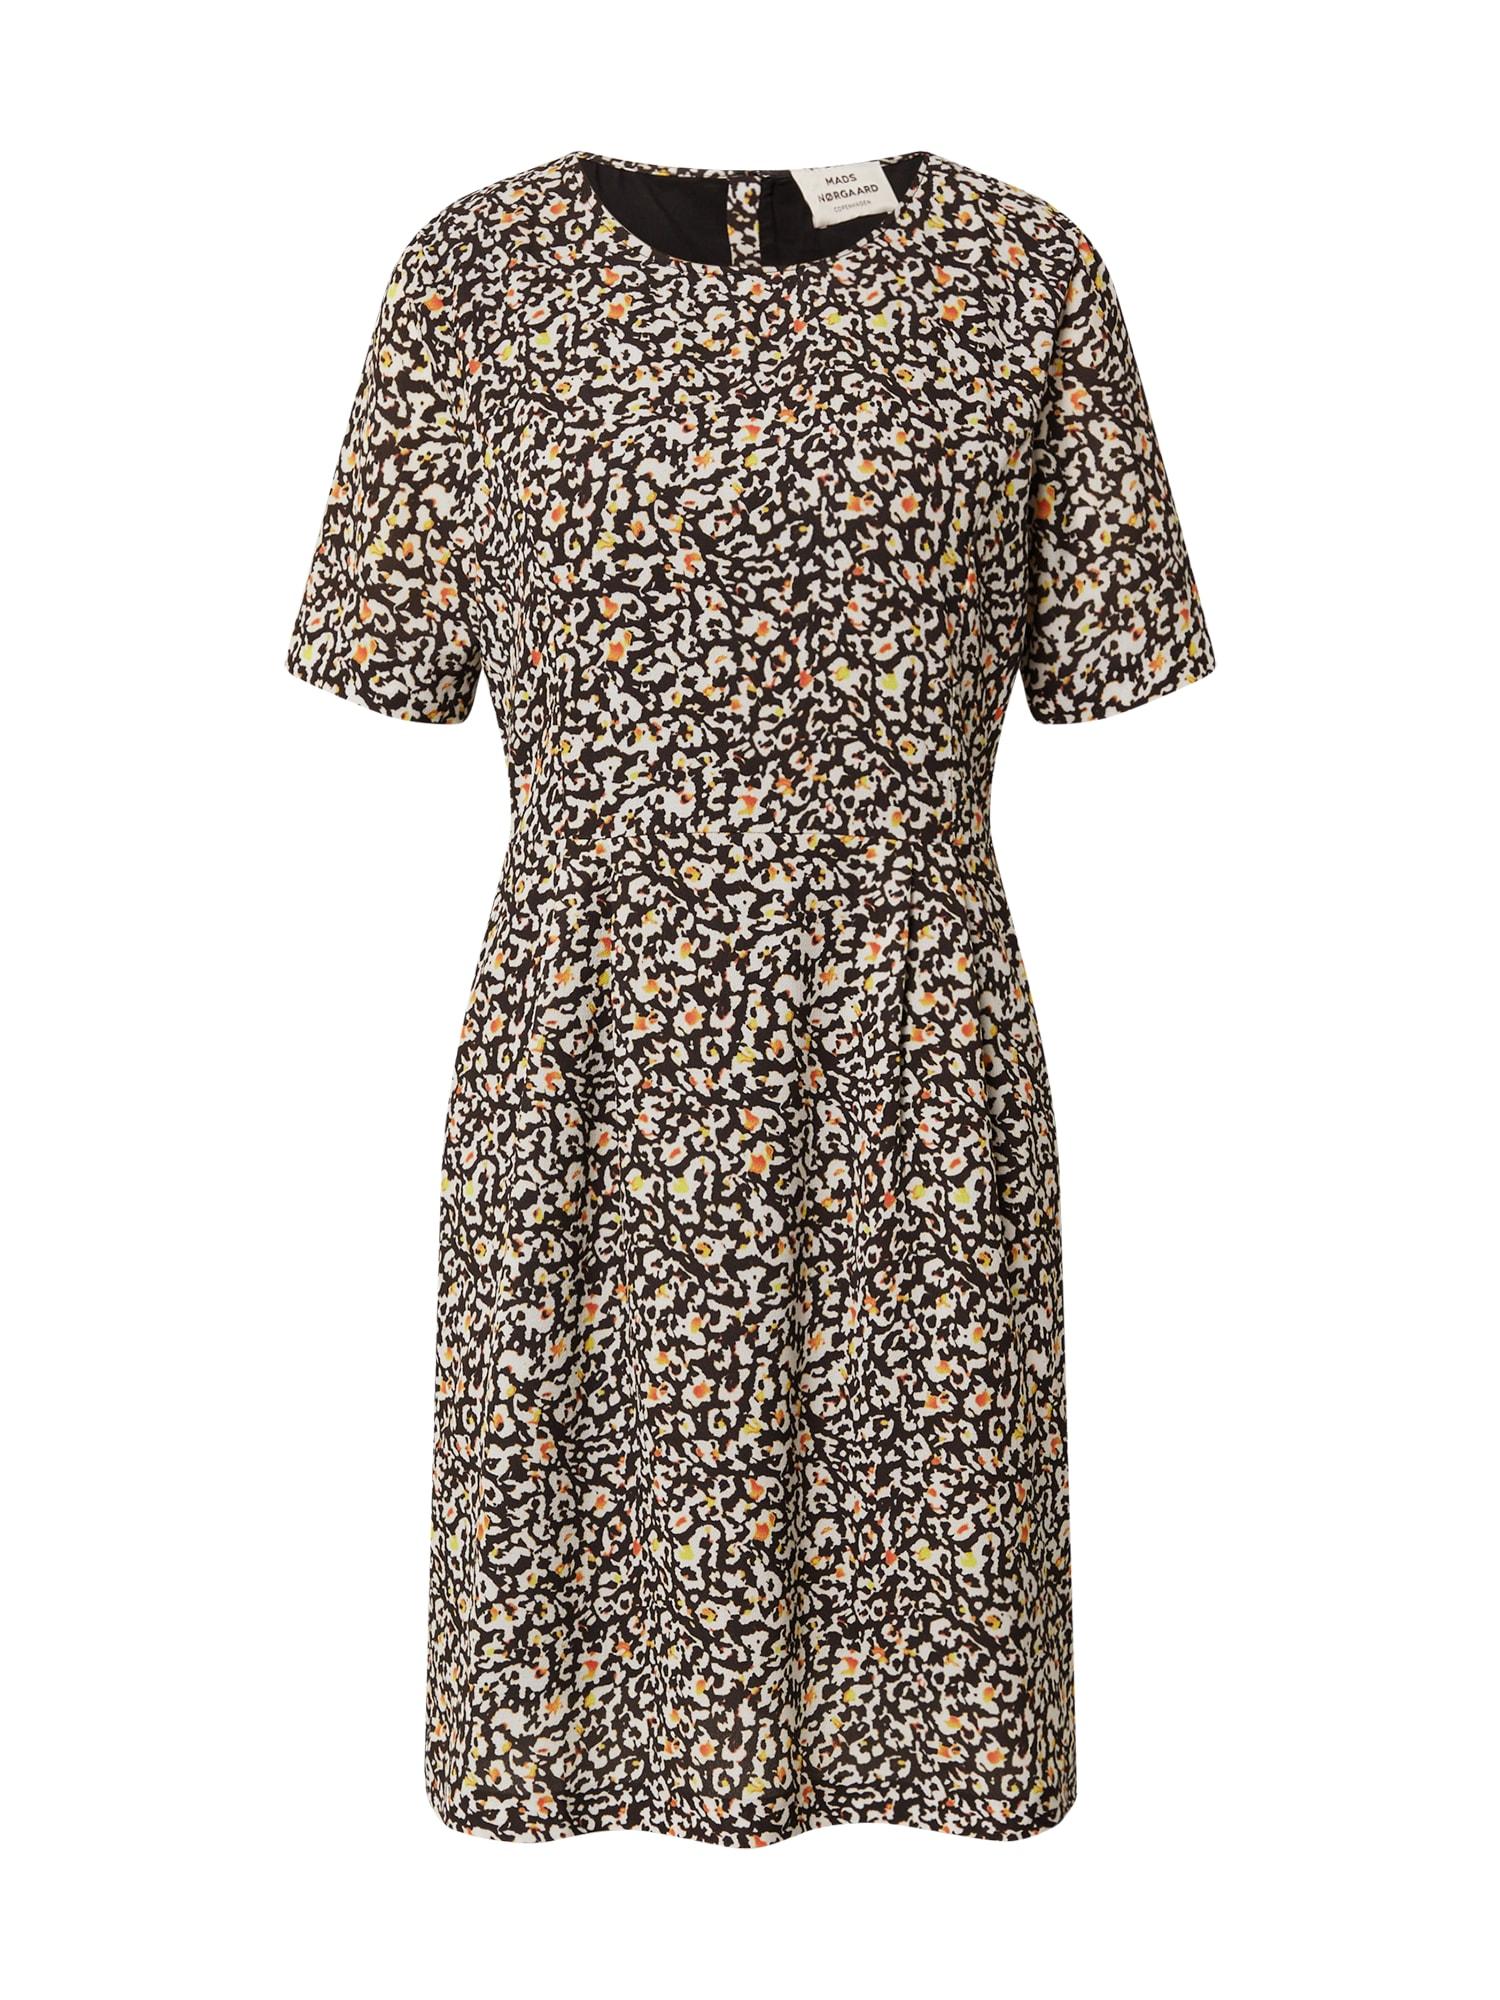 MADS NORGAARD COPENHAGEN Vasarinė suknelė 'Recina Deily' gelsvai pilka spalva / juoda / balta